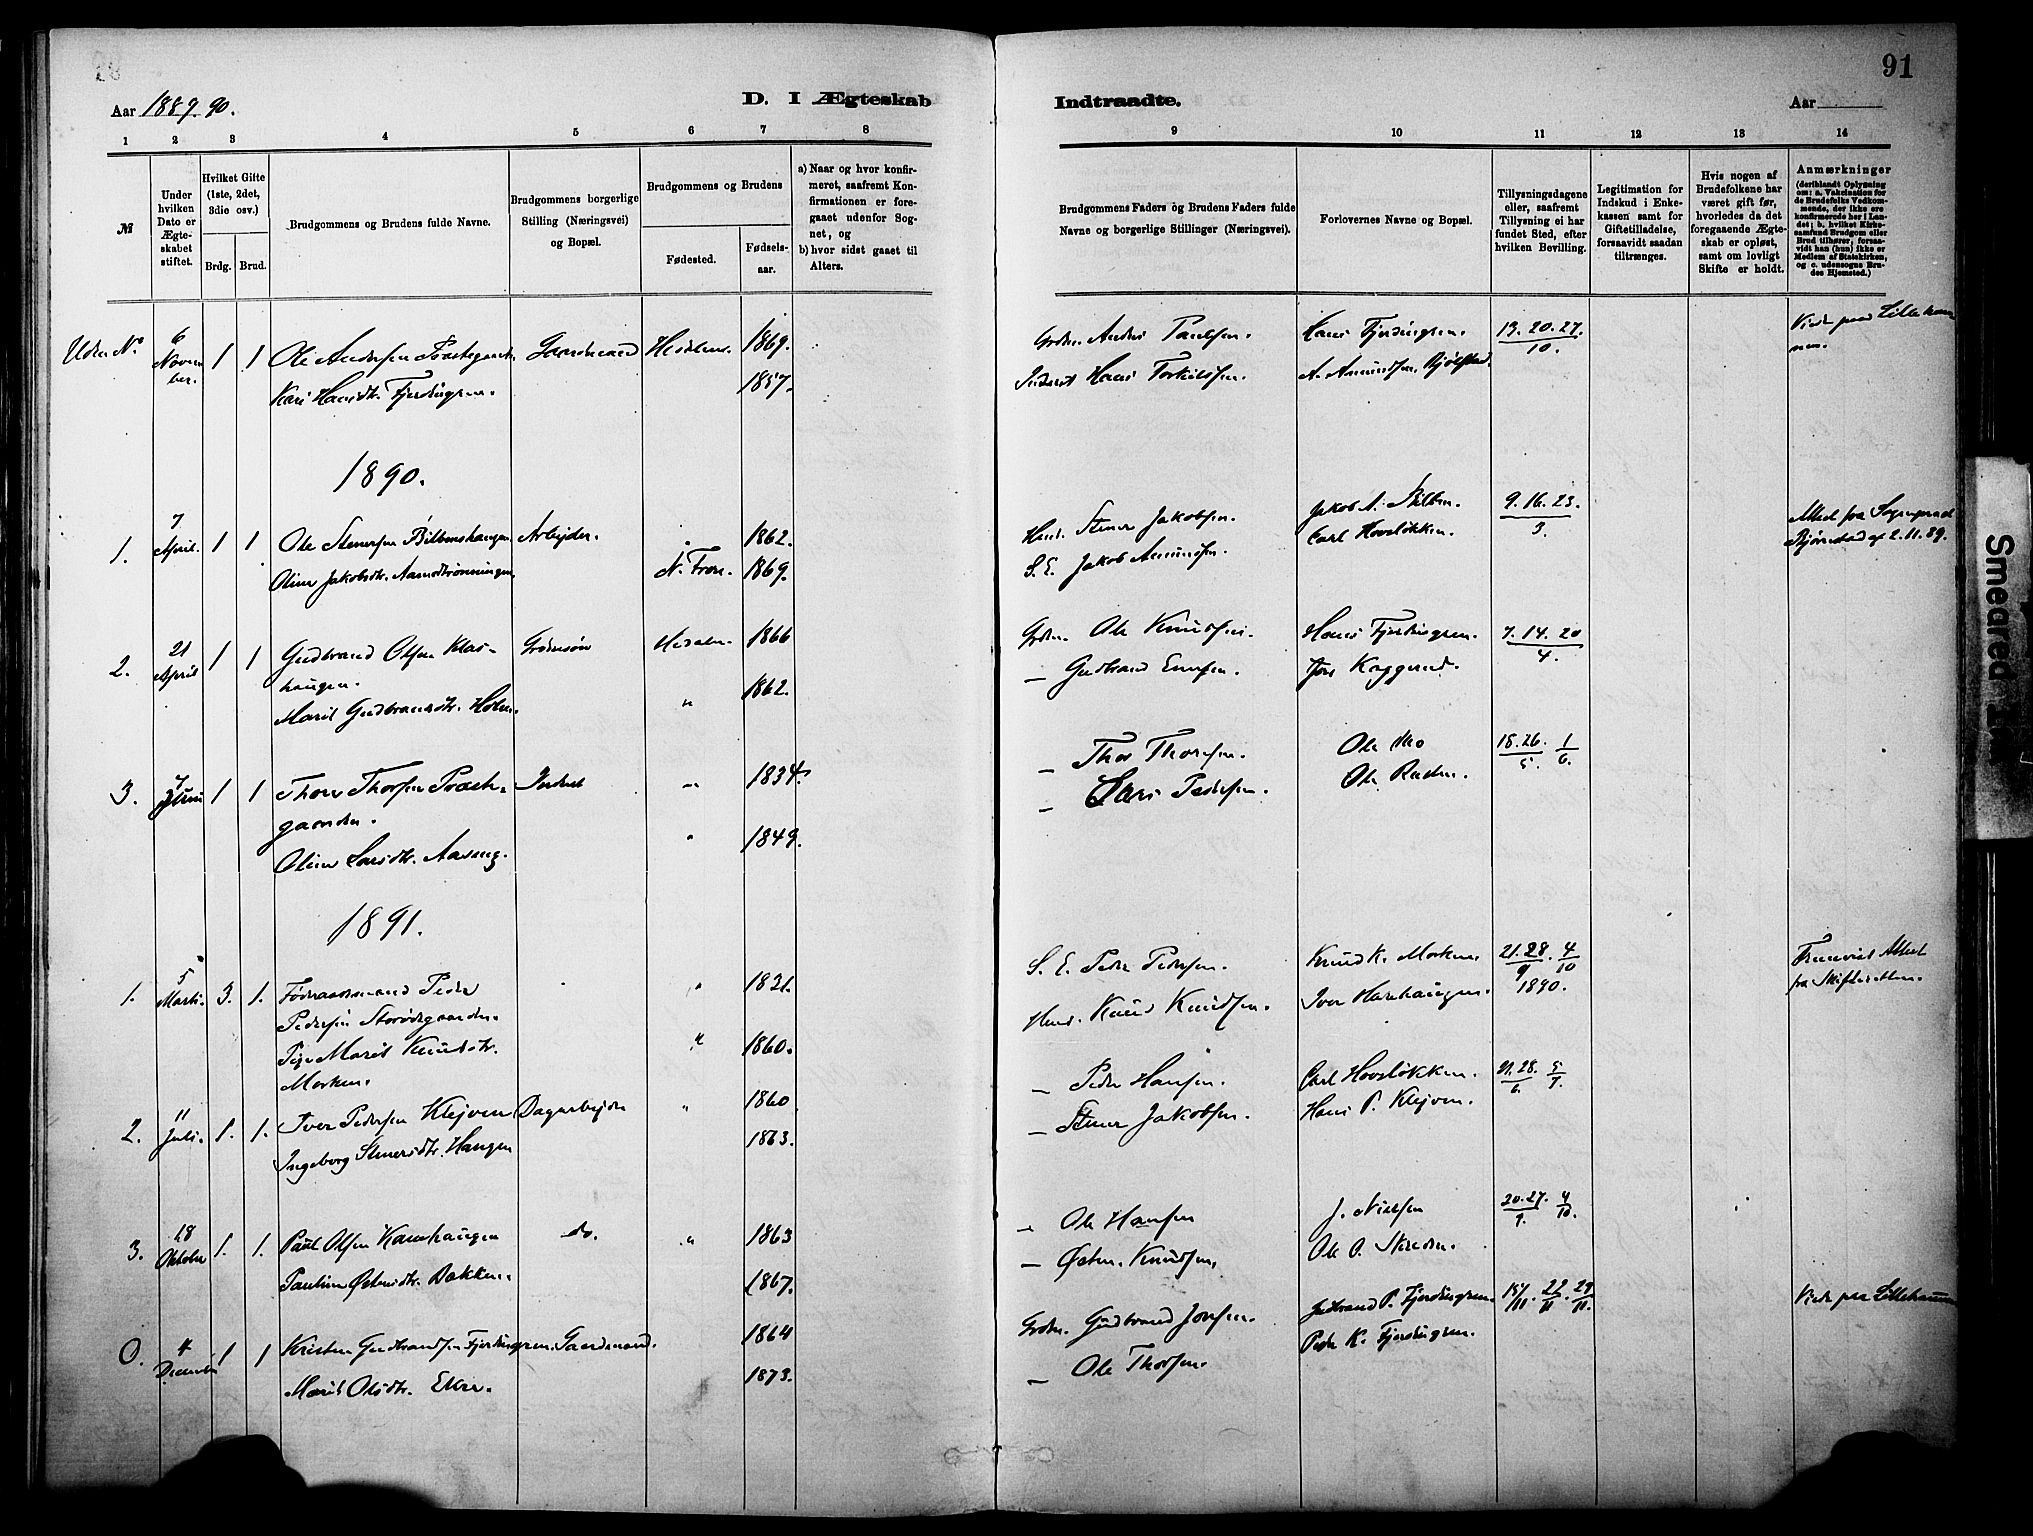 SAH, Vågå prestekontor, Ministerialbok nr. 10, 1887-1904, s. 91